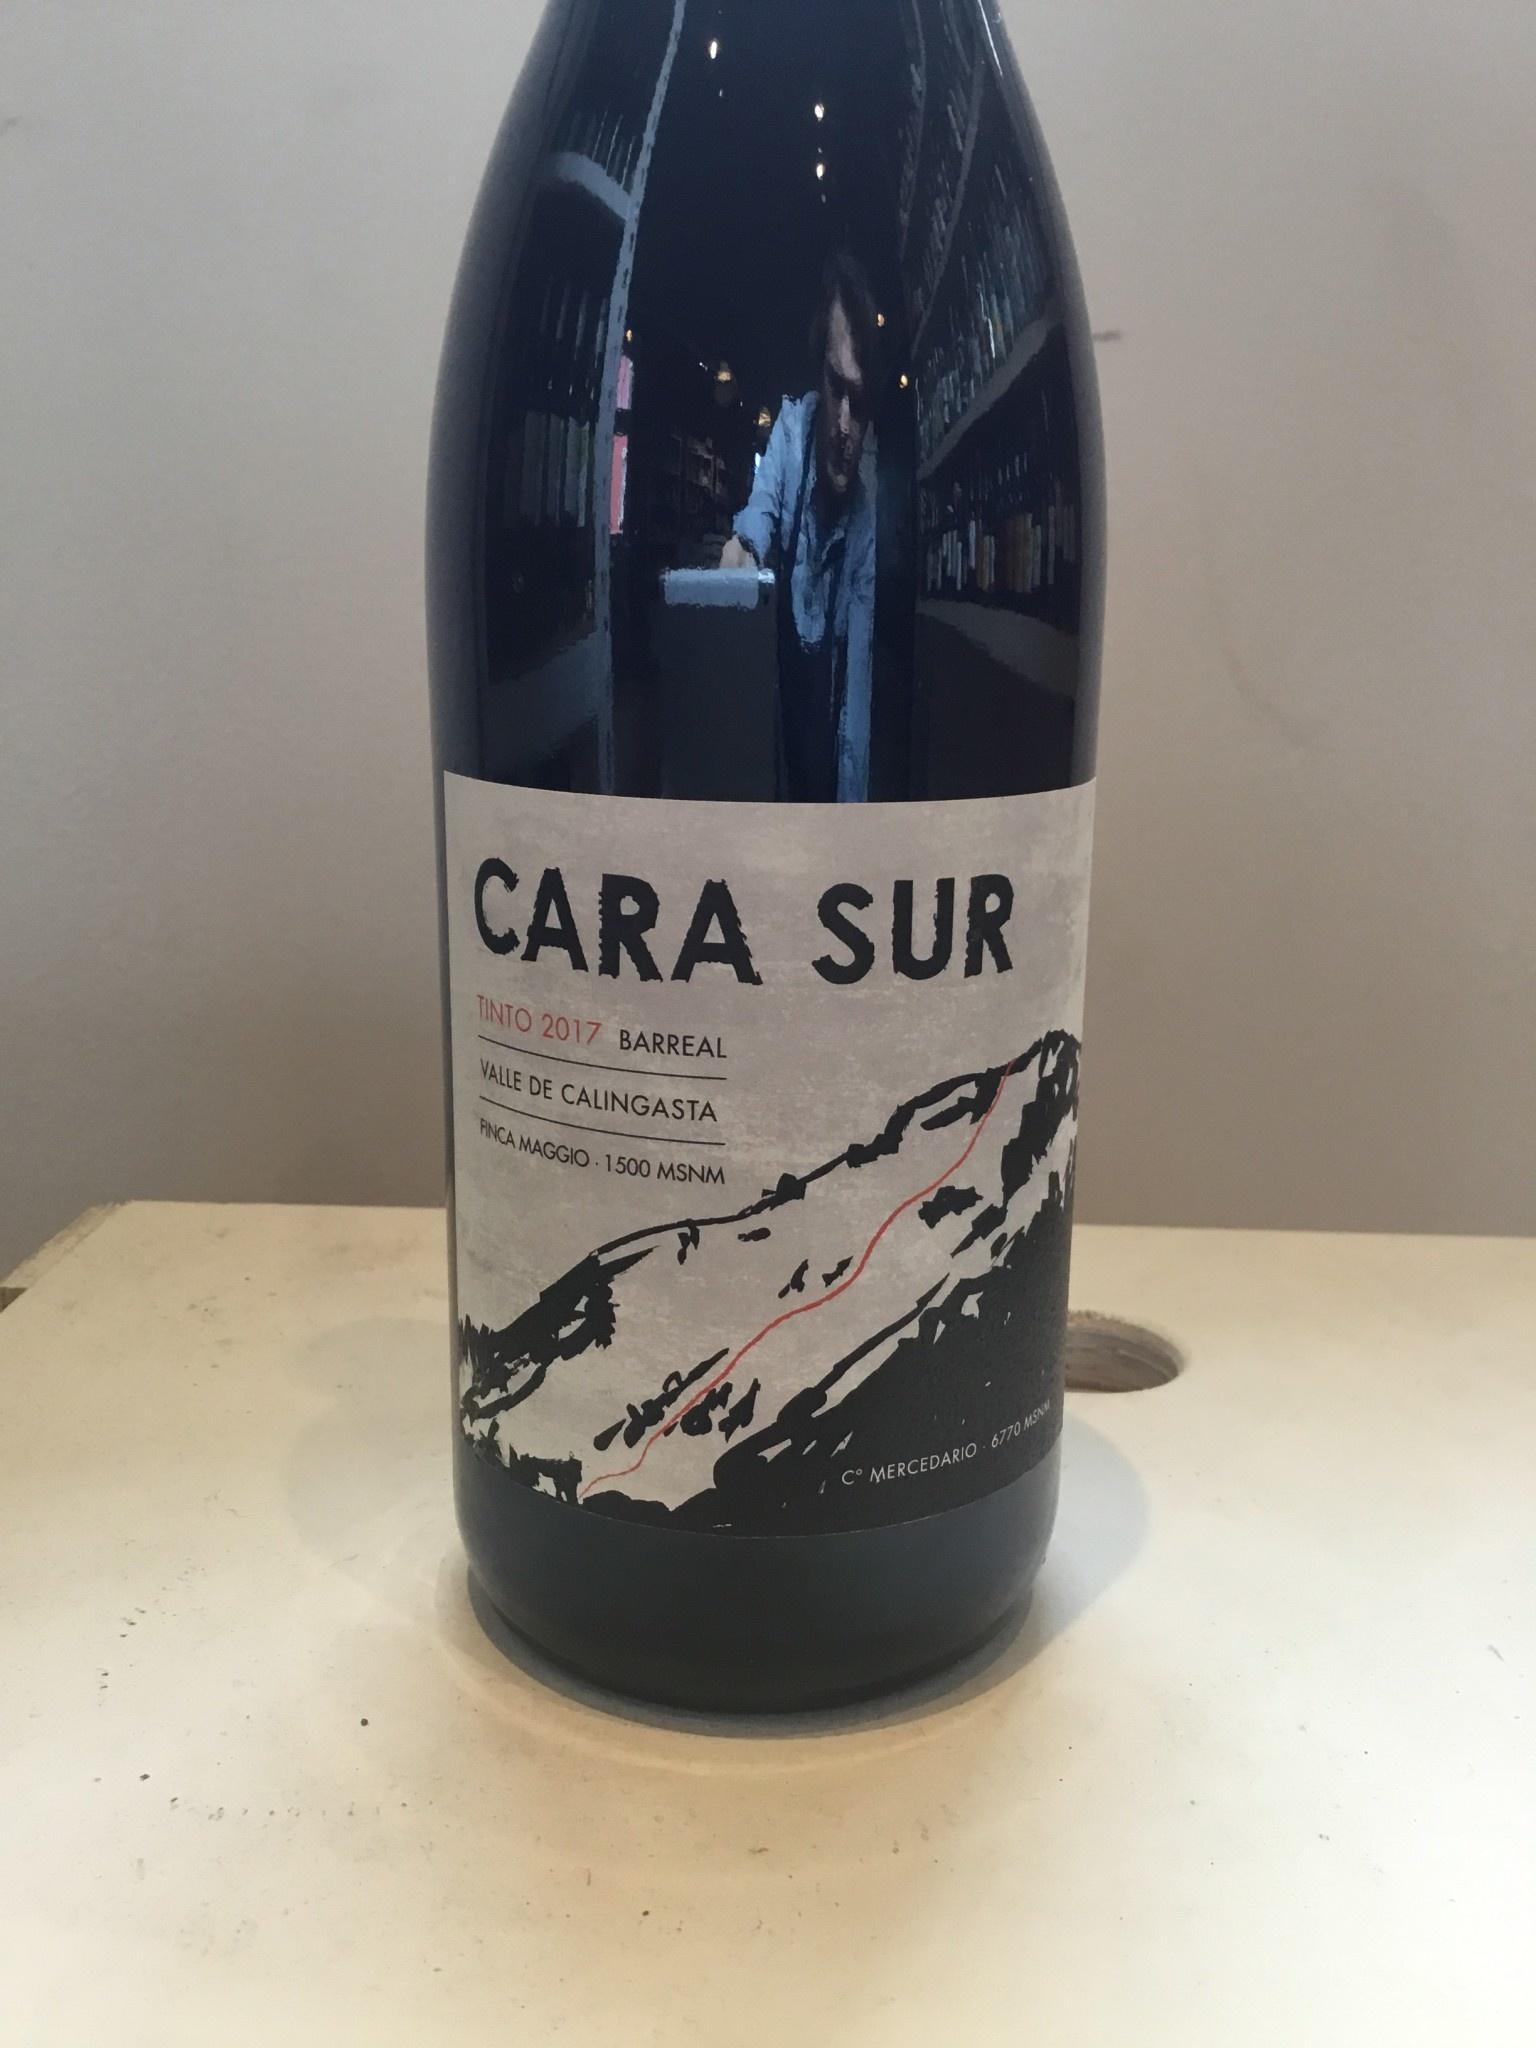 2017 Cara Sur Tinto Barreal, 750ml